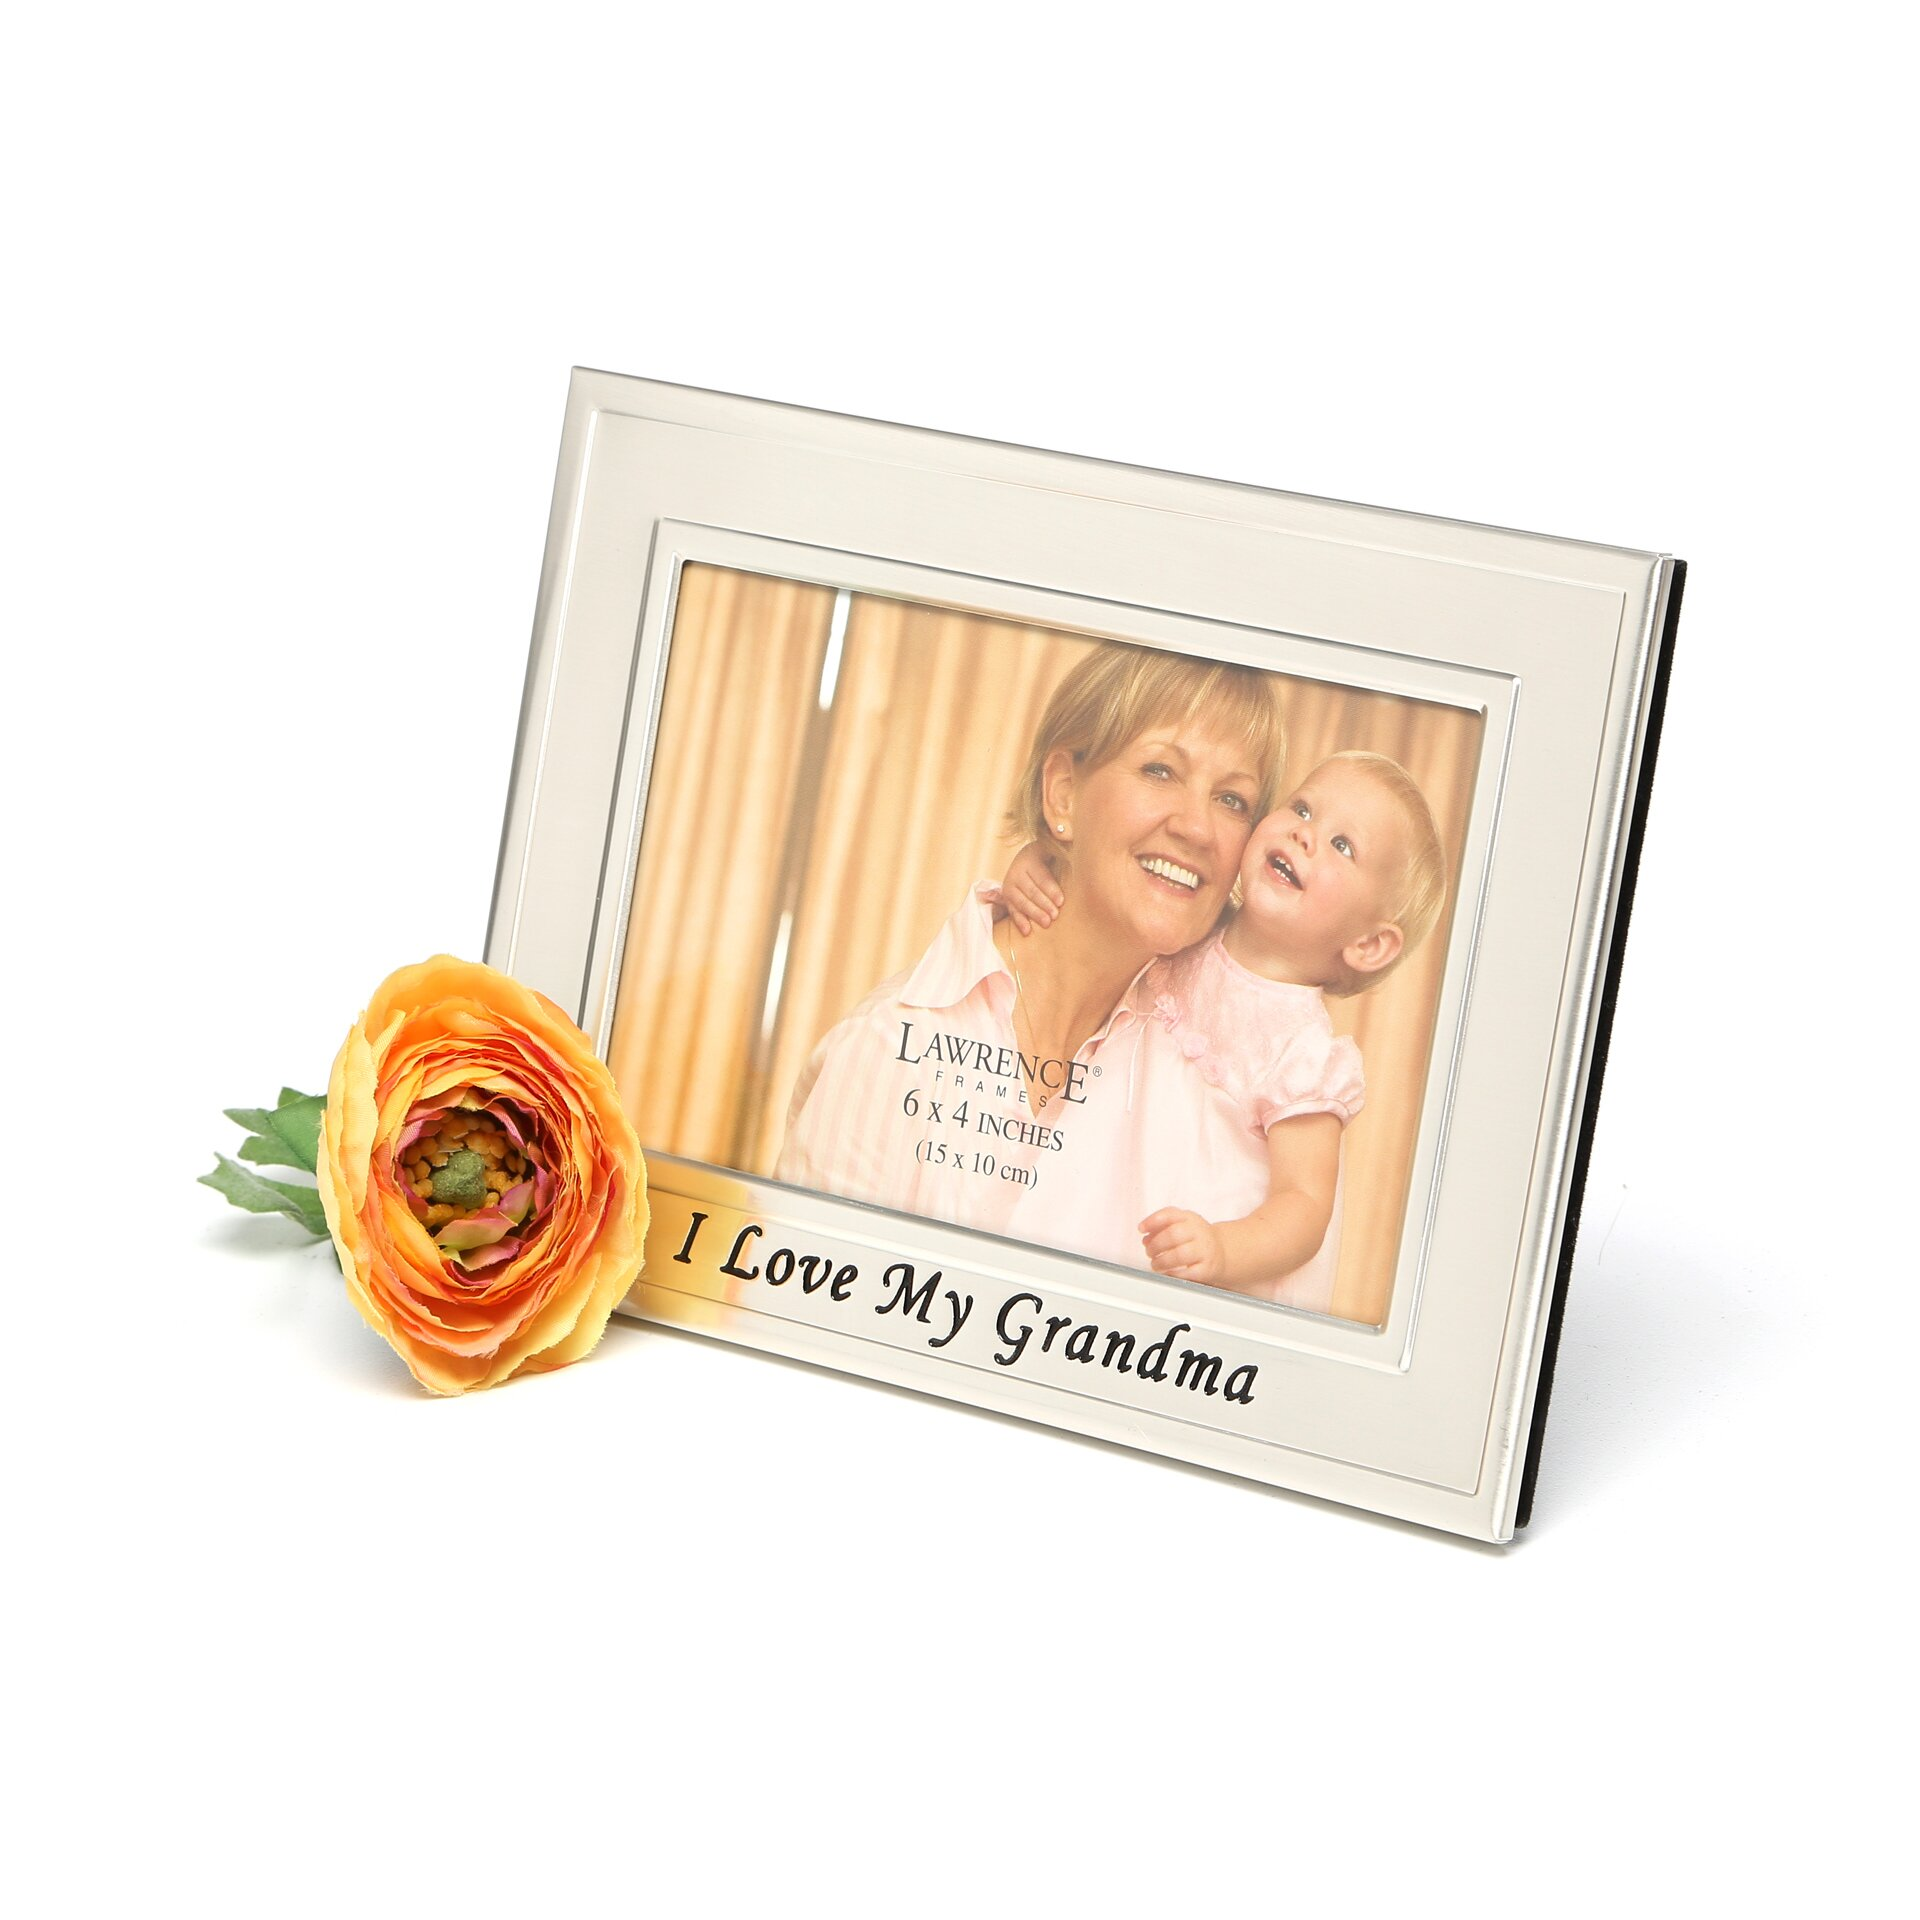 I Love My Grandma Picture Frame Wayfair